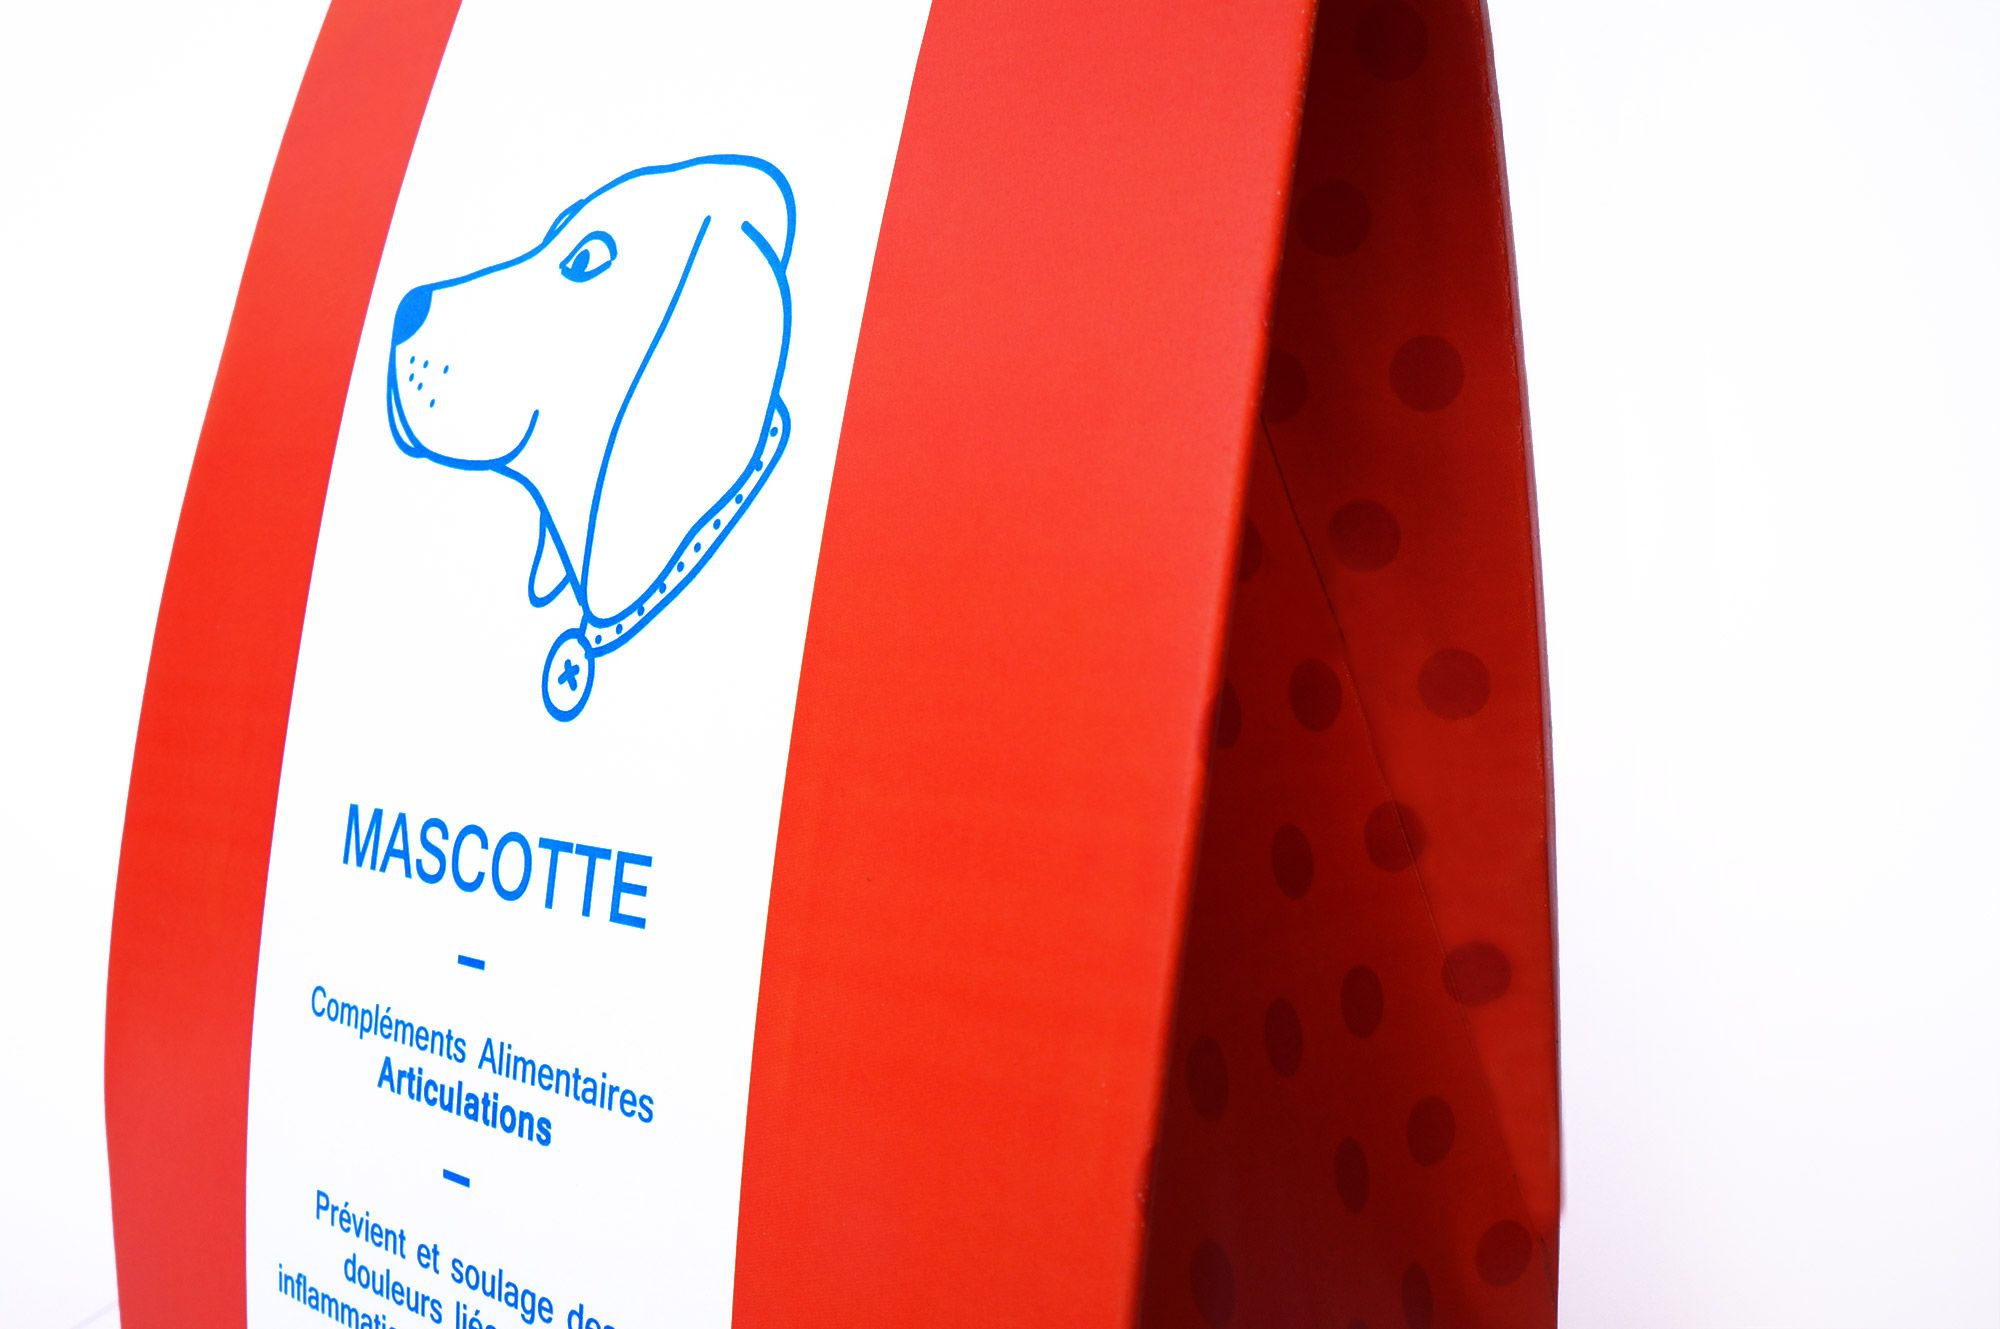 Mascotte nora renaud design packaging mascotte